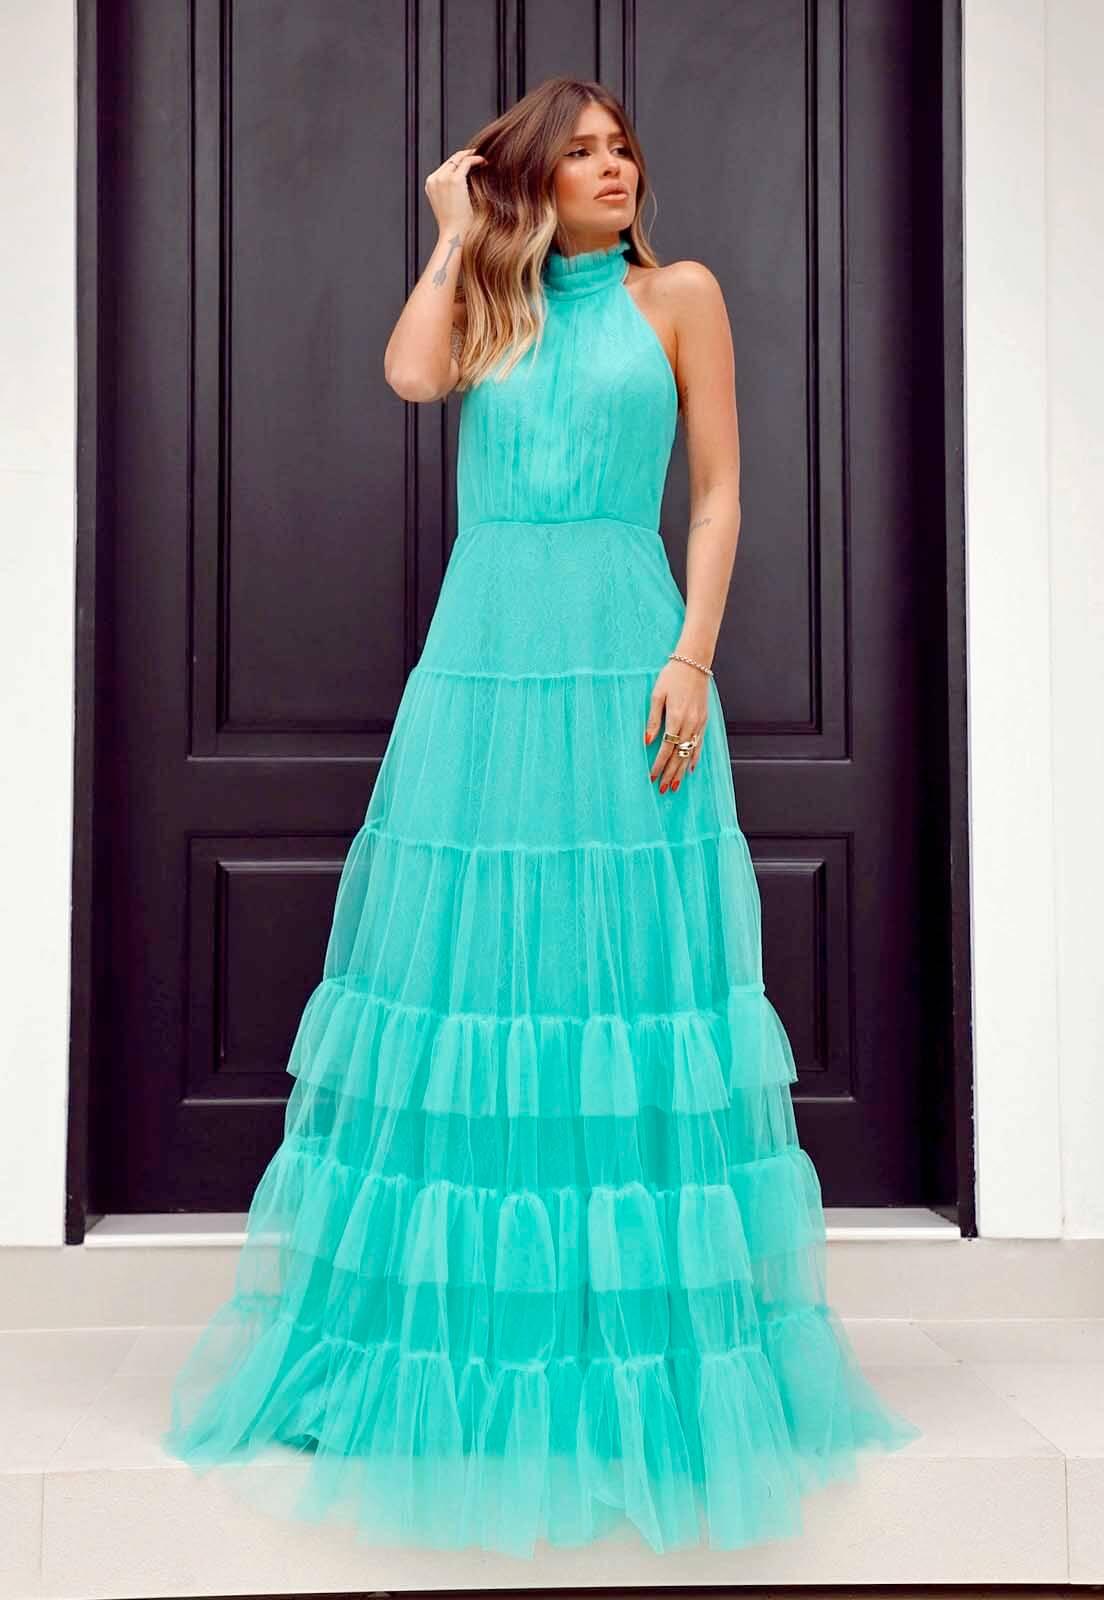 Vestido Gola Alta Tule Azul Tiffany